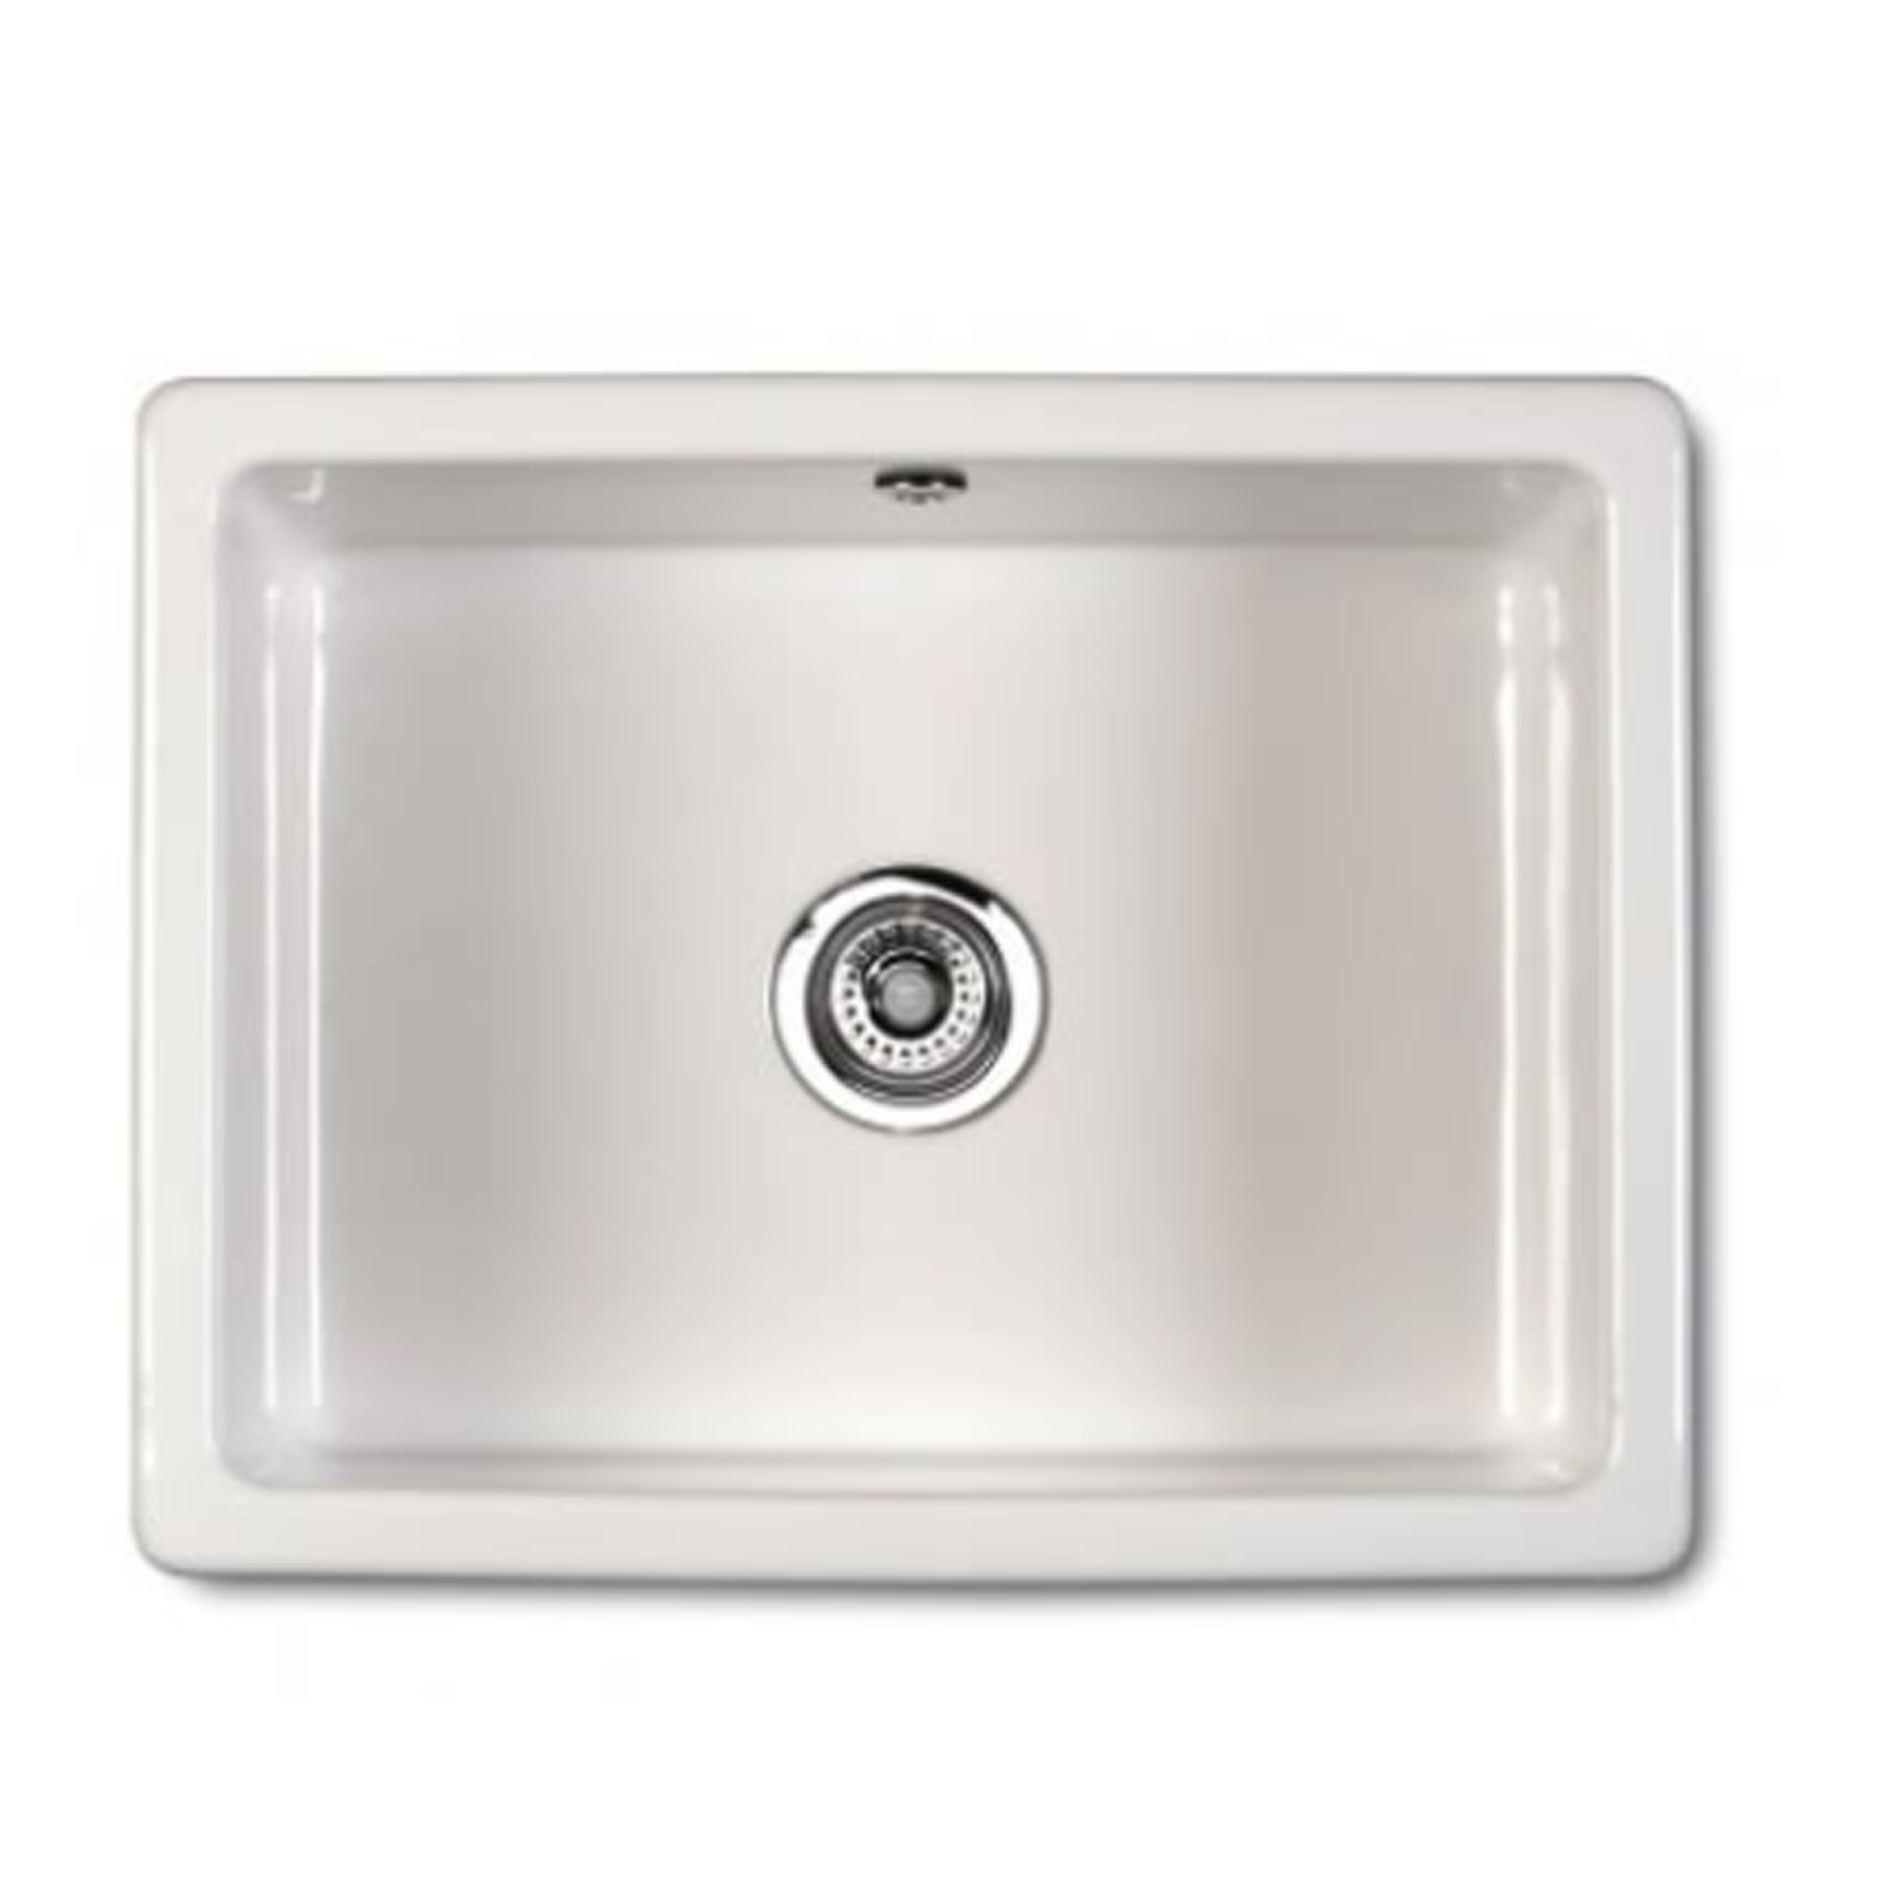 Shaws: Classic Inset Ceramic Sink - Kitchen Sinks & Taps